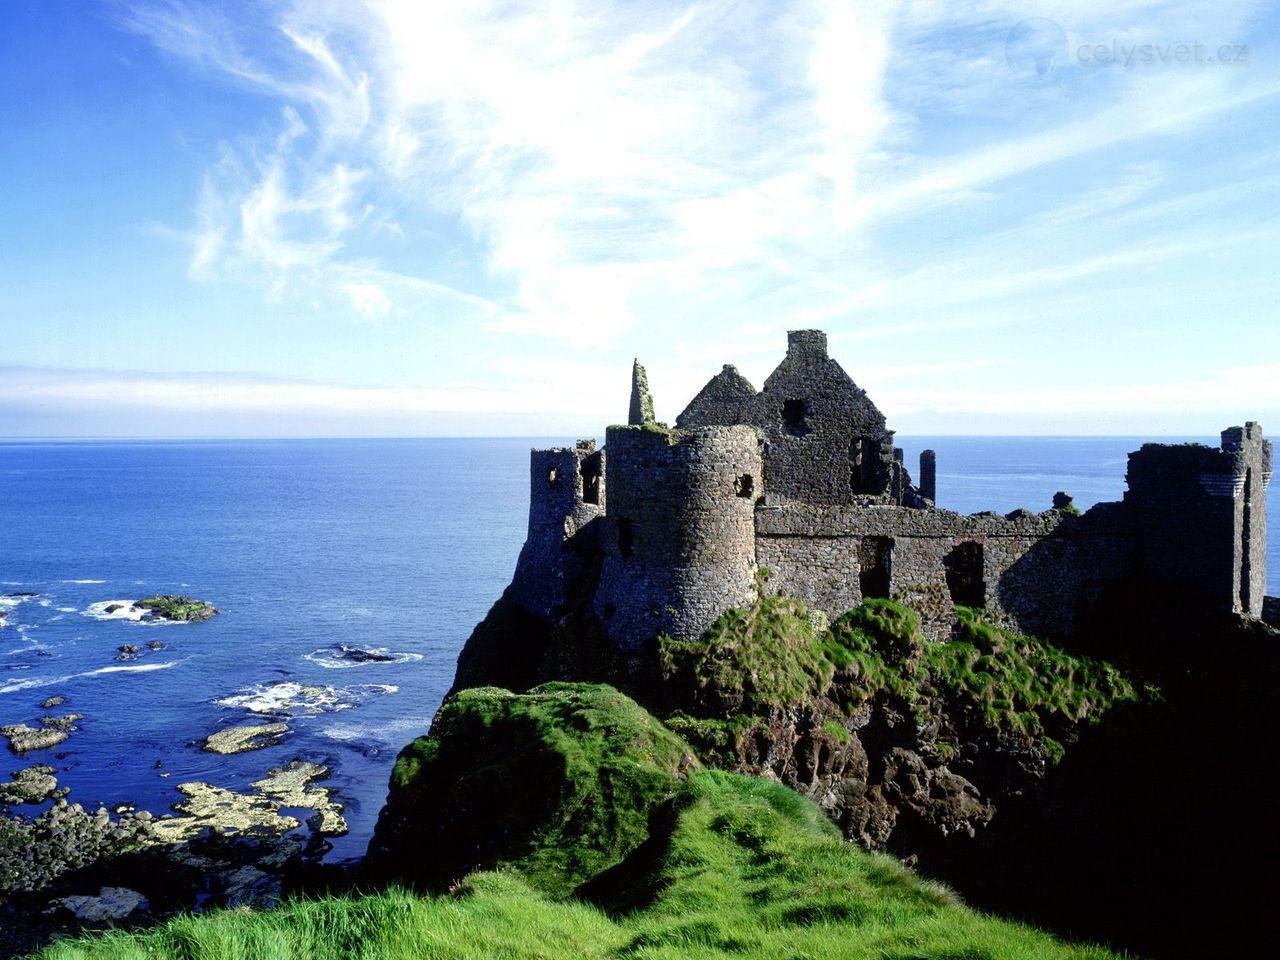 travel to poland and ireland